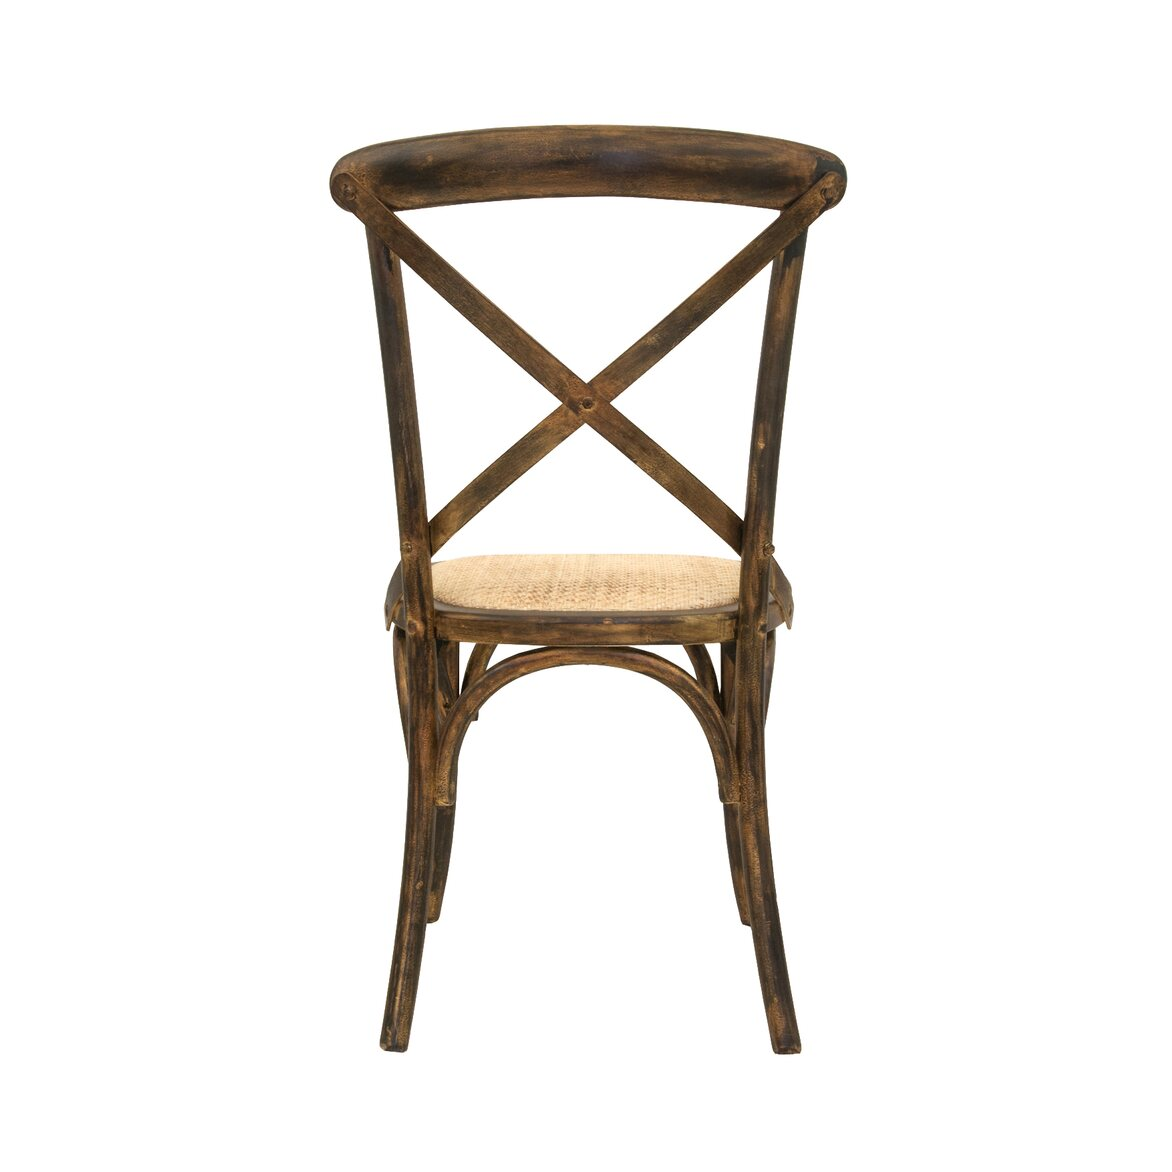 Стул Cross back bronze 3 | Обеденные стулья Kingsby